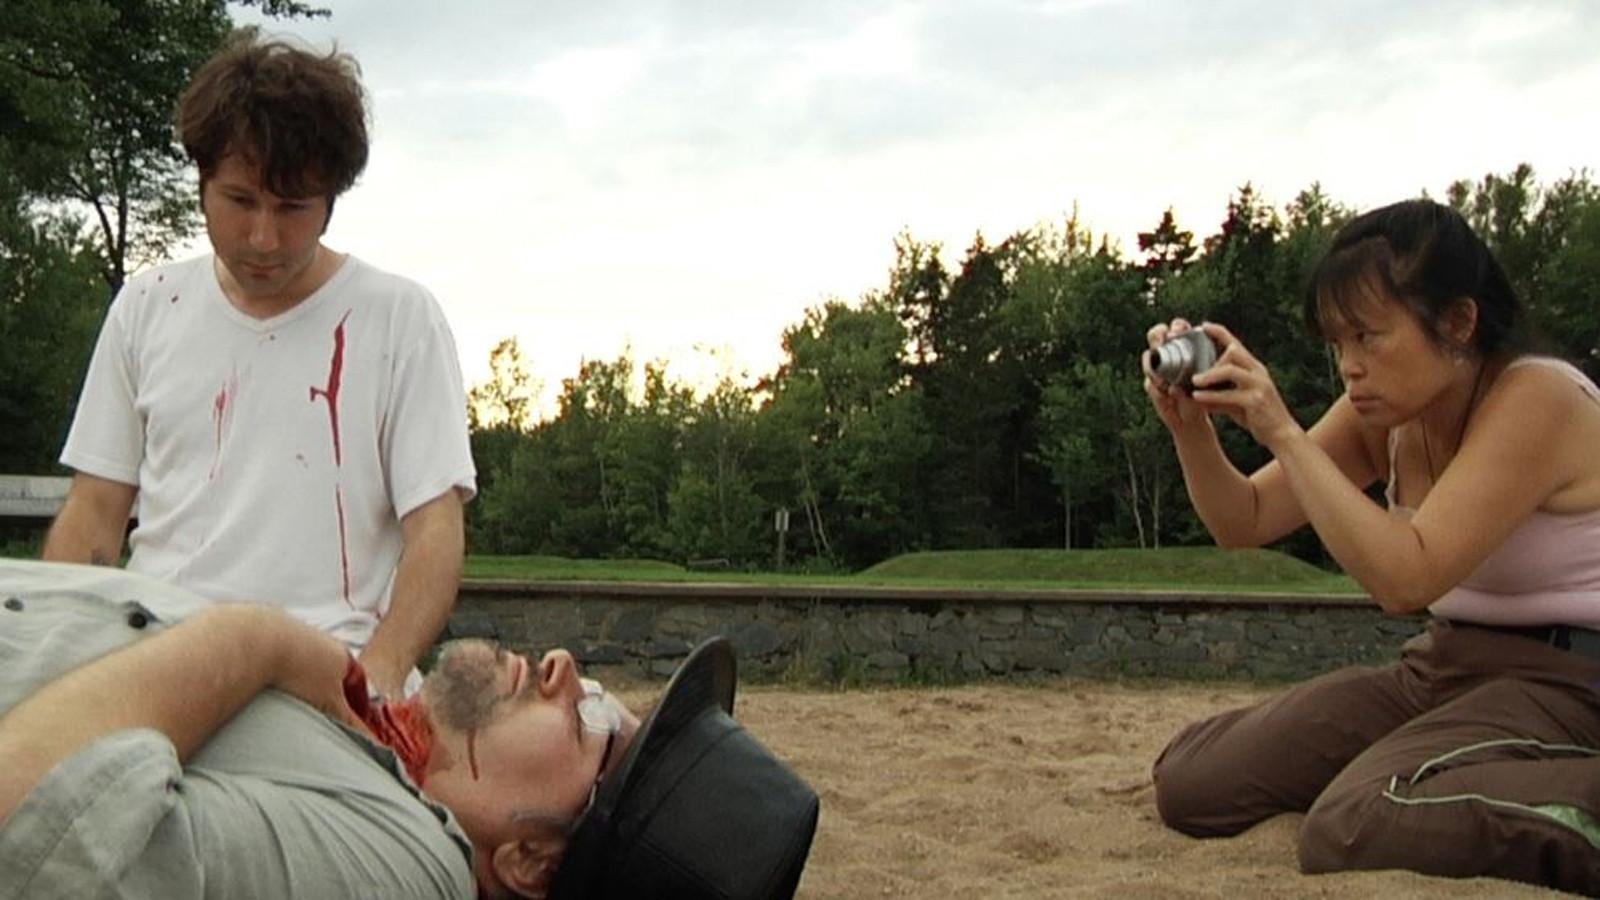 Fudged or not, 'Kung Fu Elliot' is amusing take on a big dream